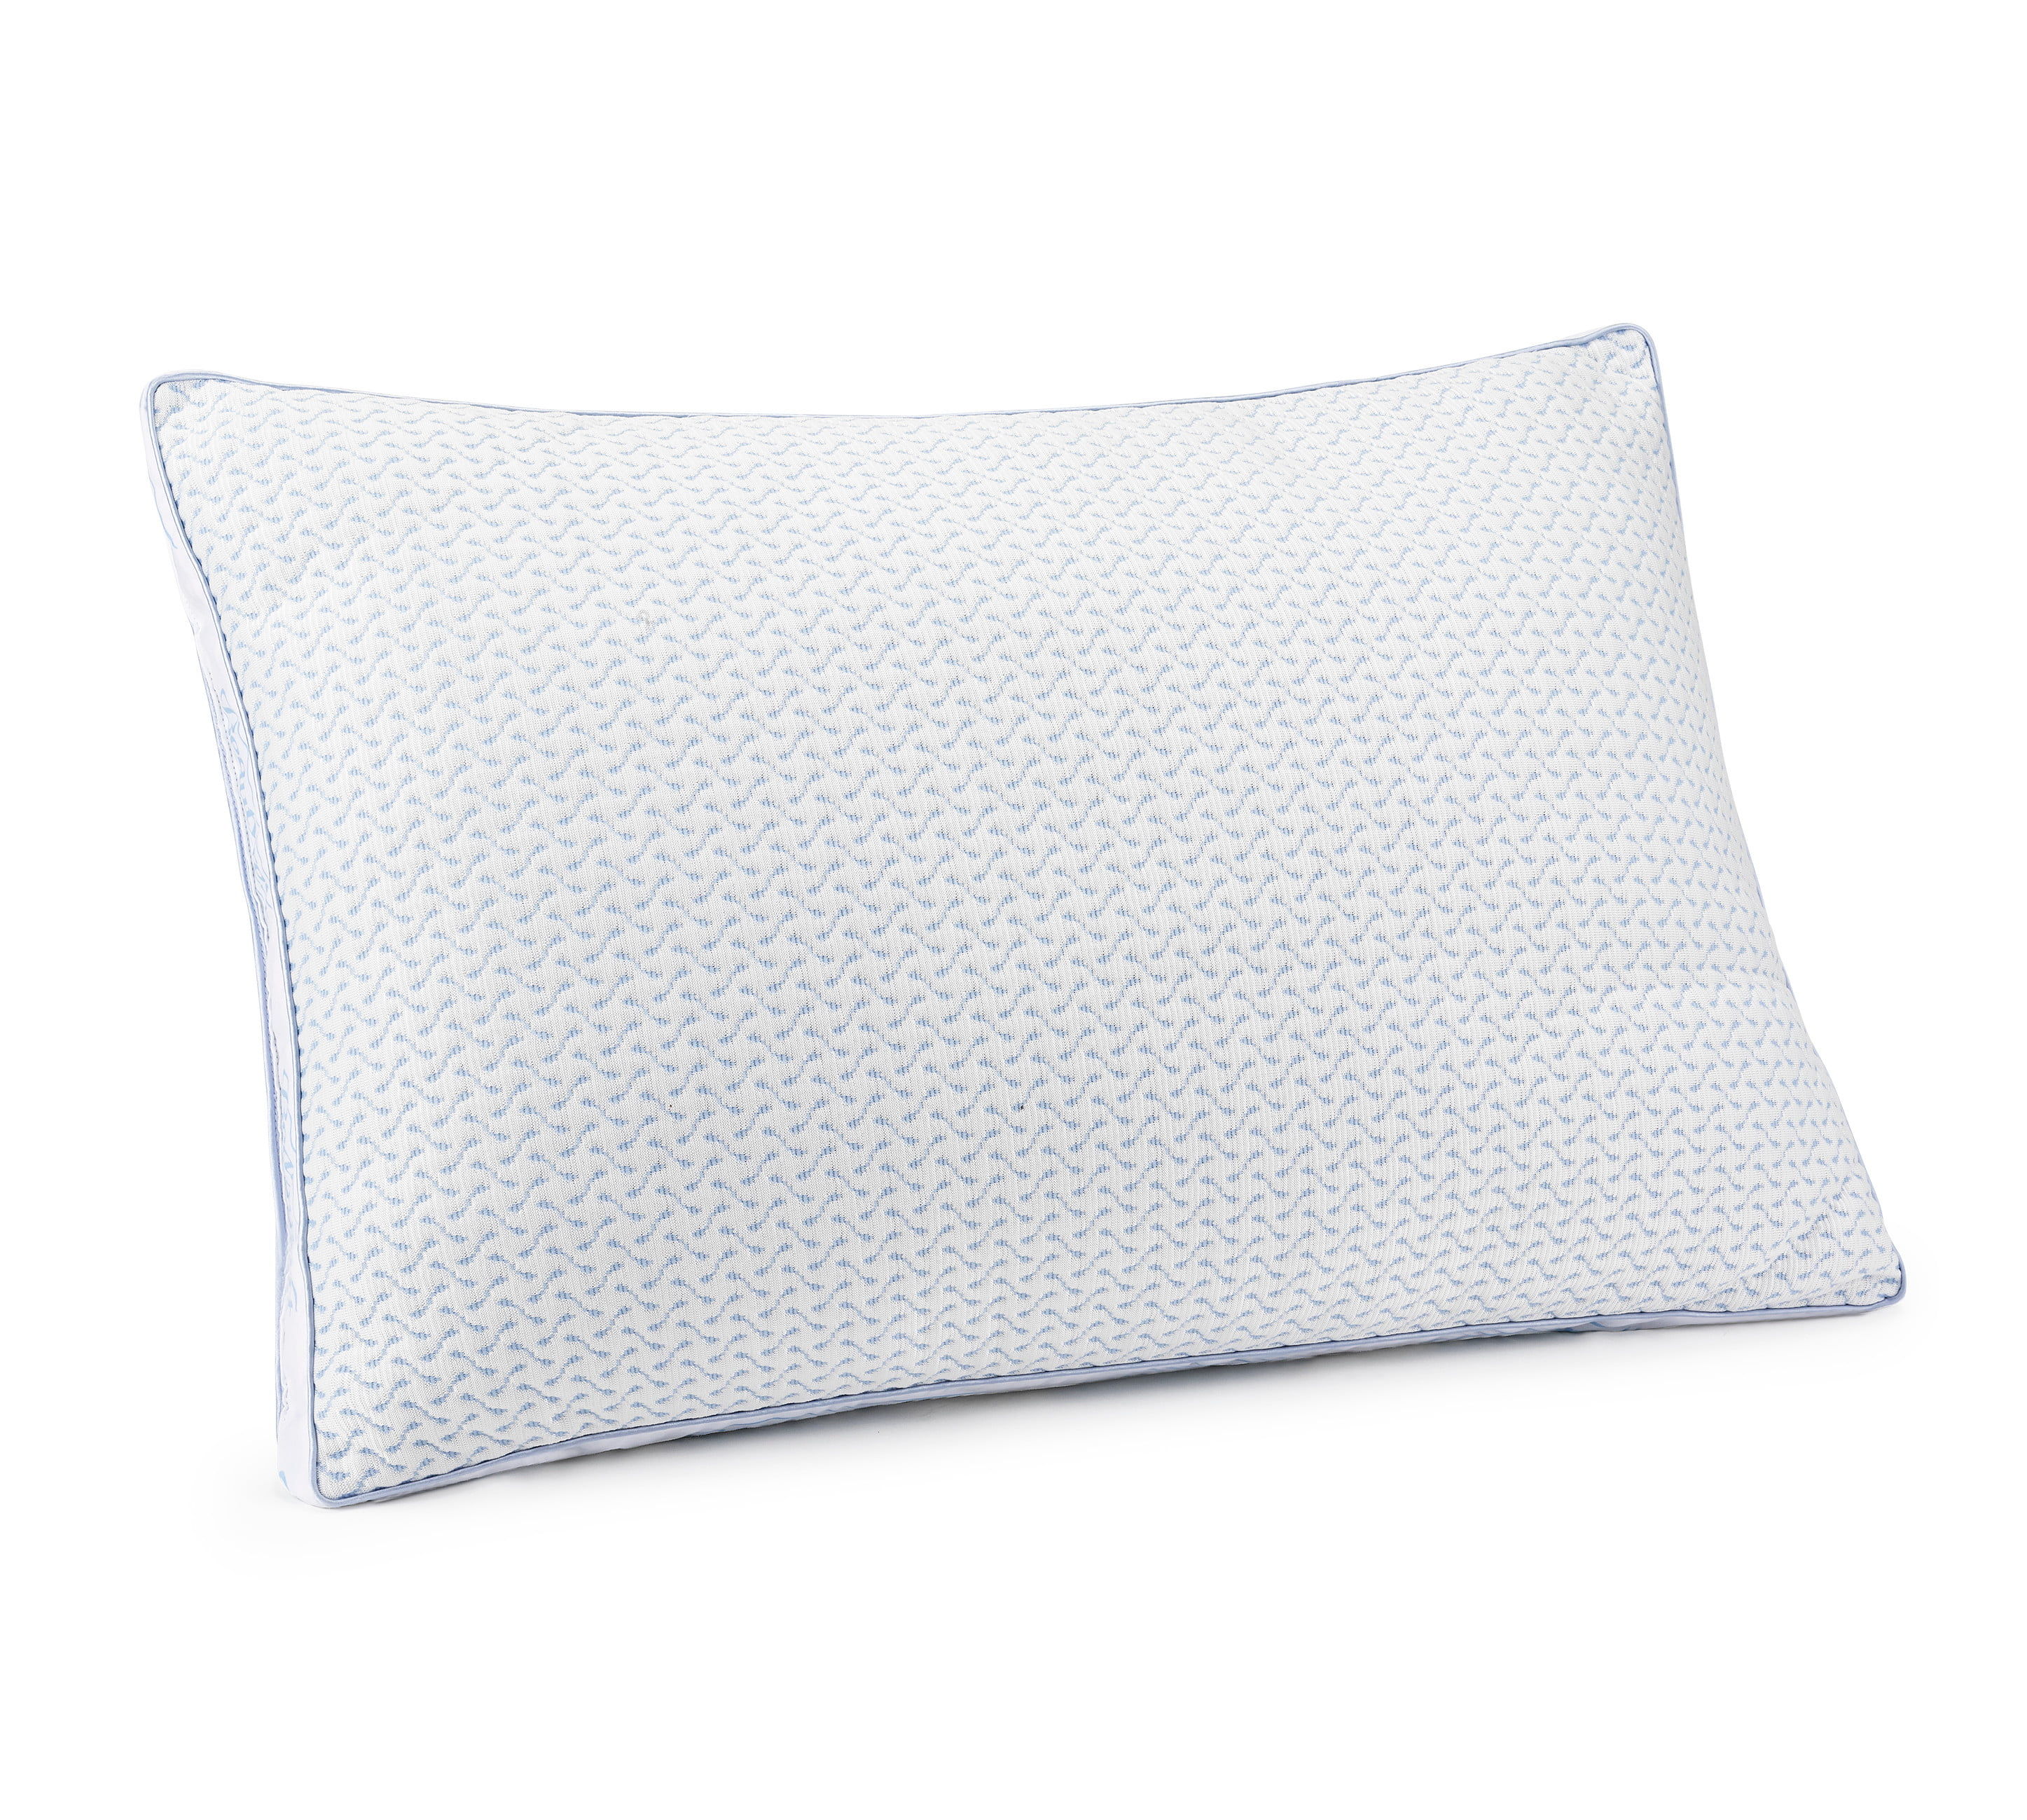 beautyrest silver sensacool performance pillow in multiple sizes walmart com